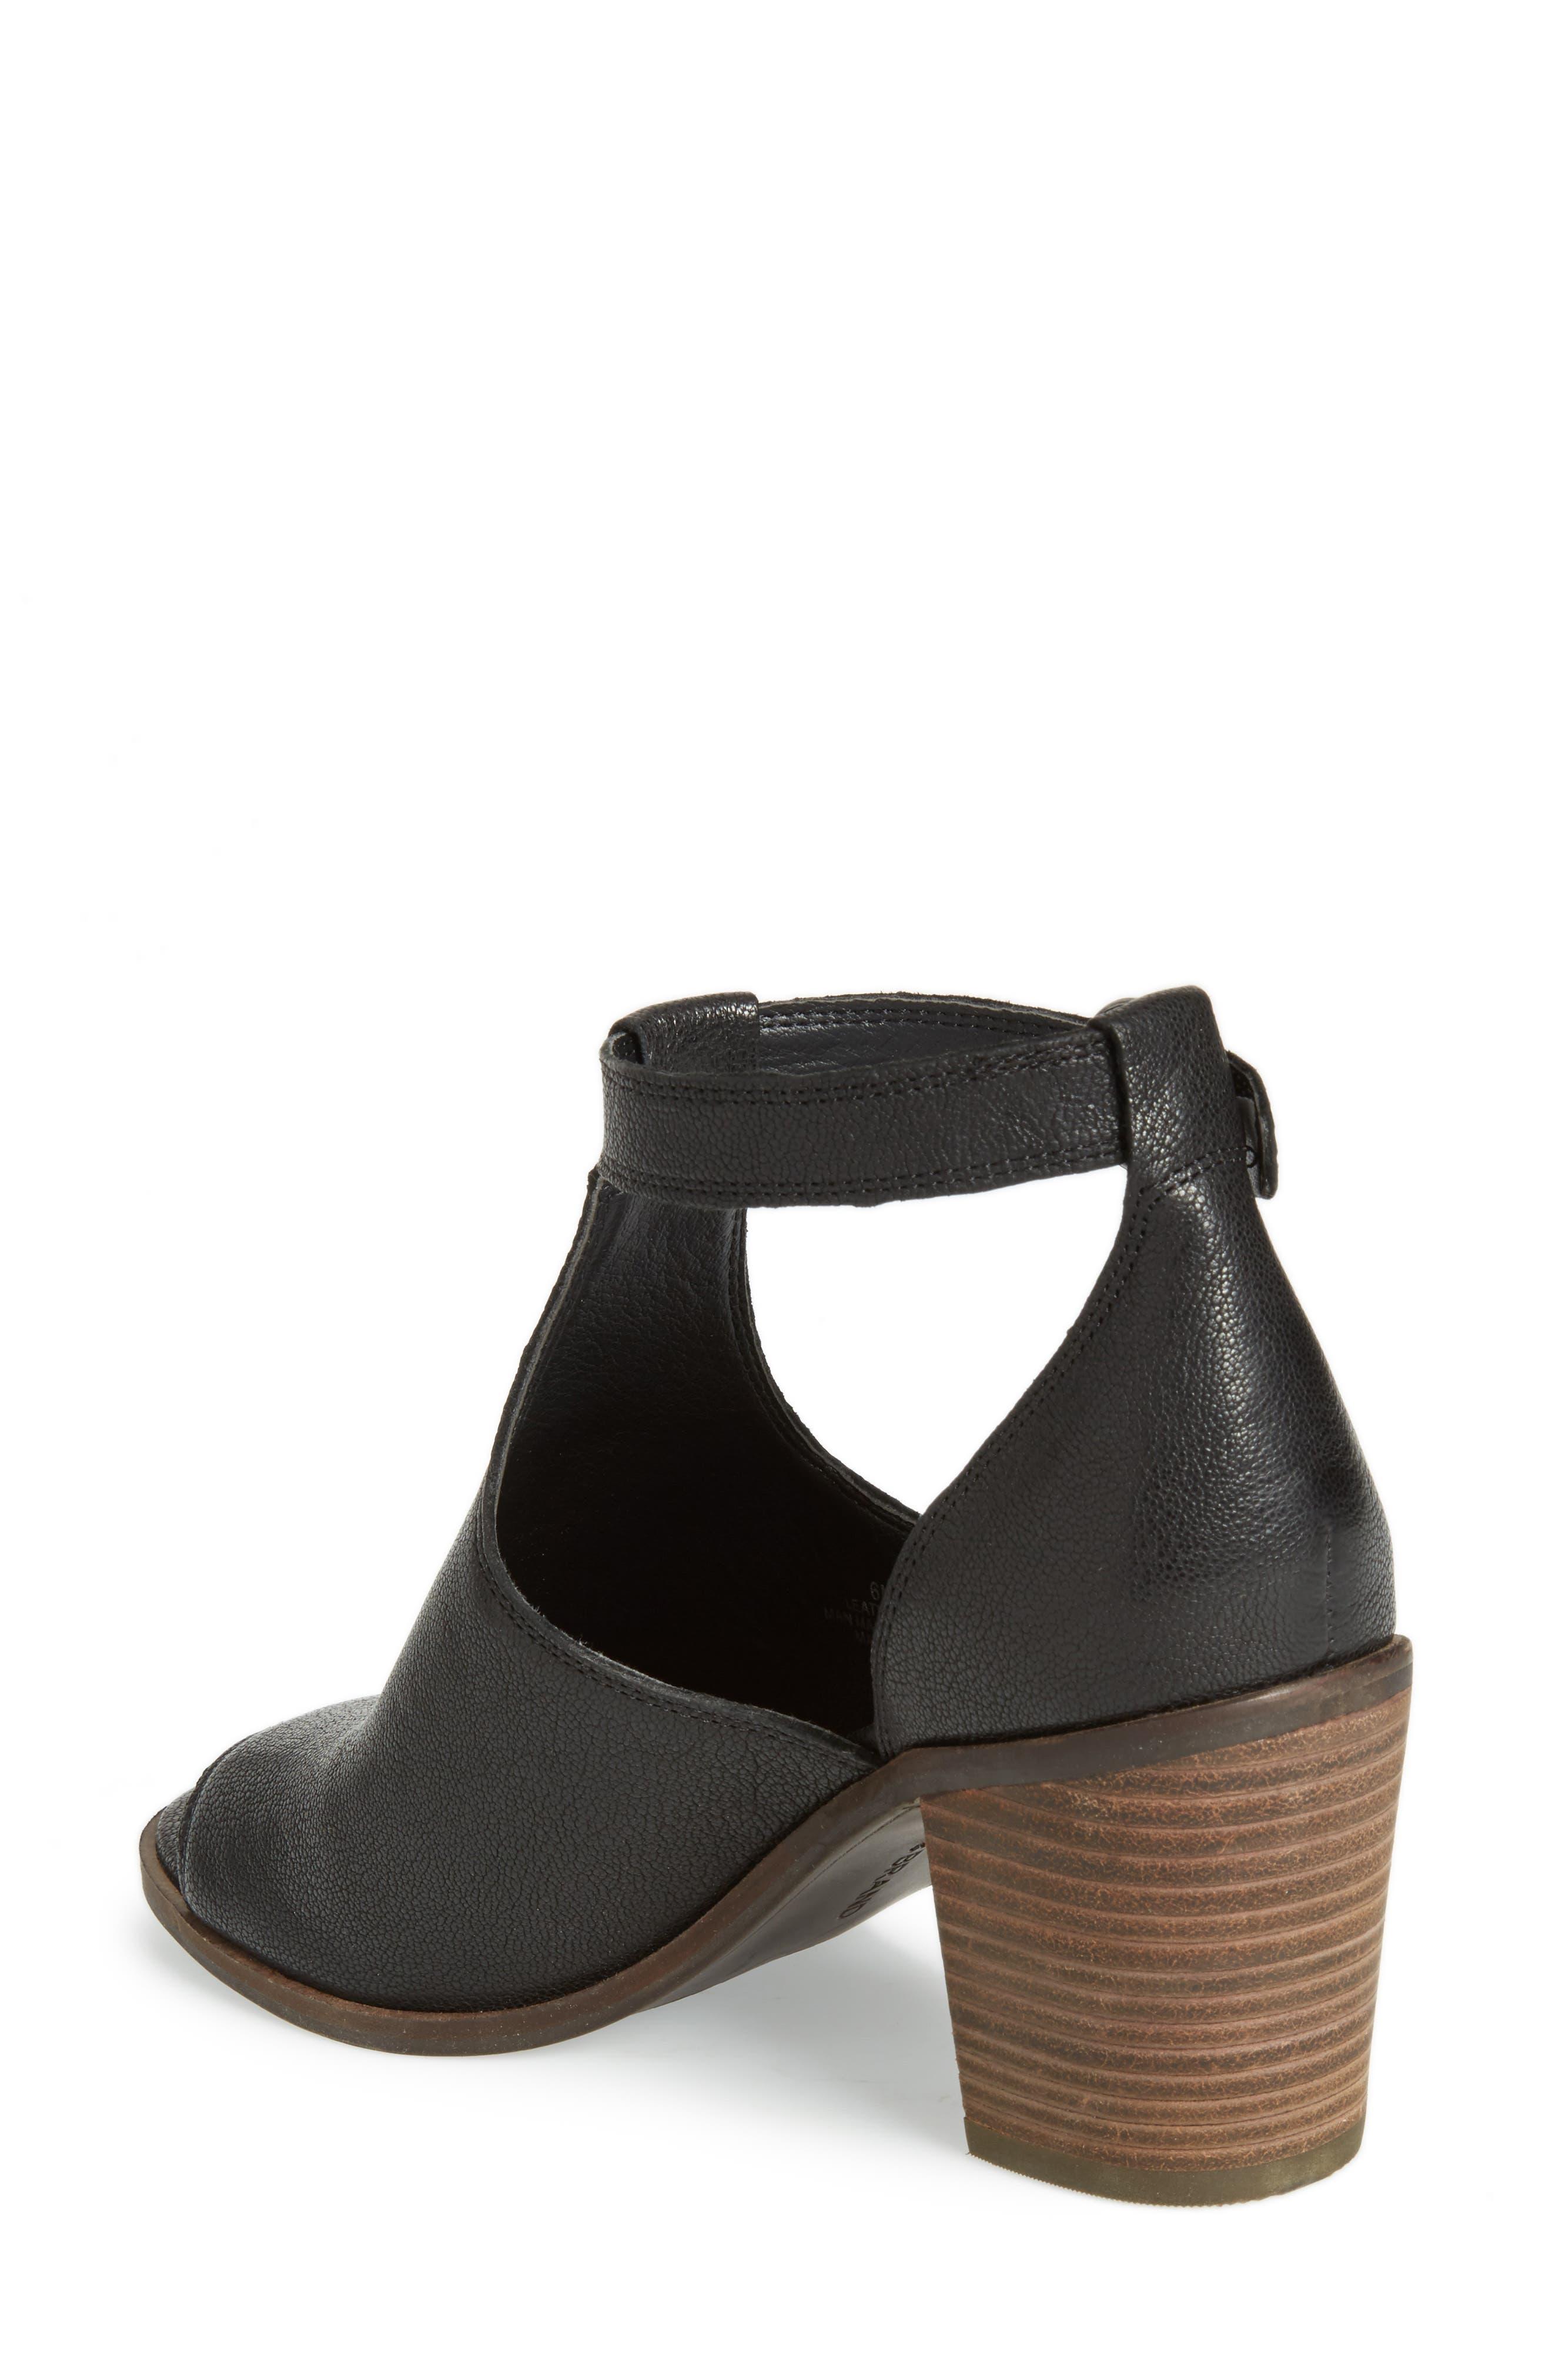 Kadian Block Heel Sandal,                             Alternate thumbnail 2, color,                             Black Leather